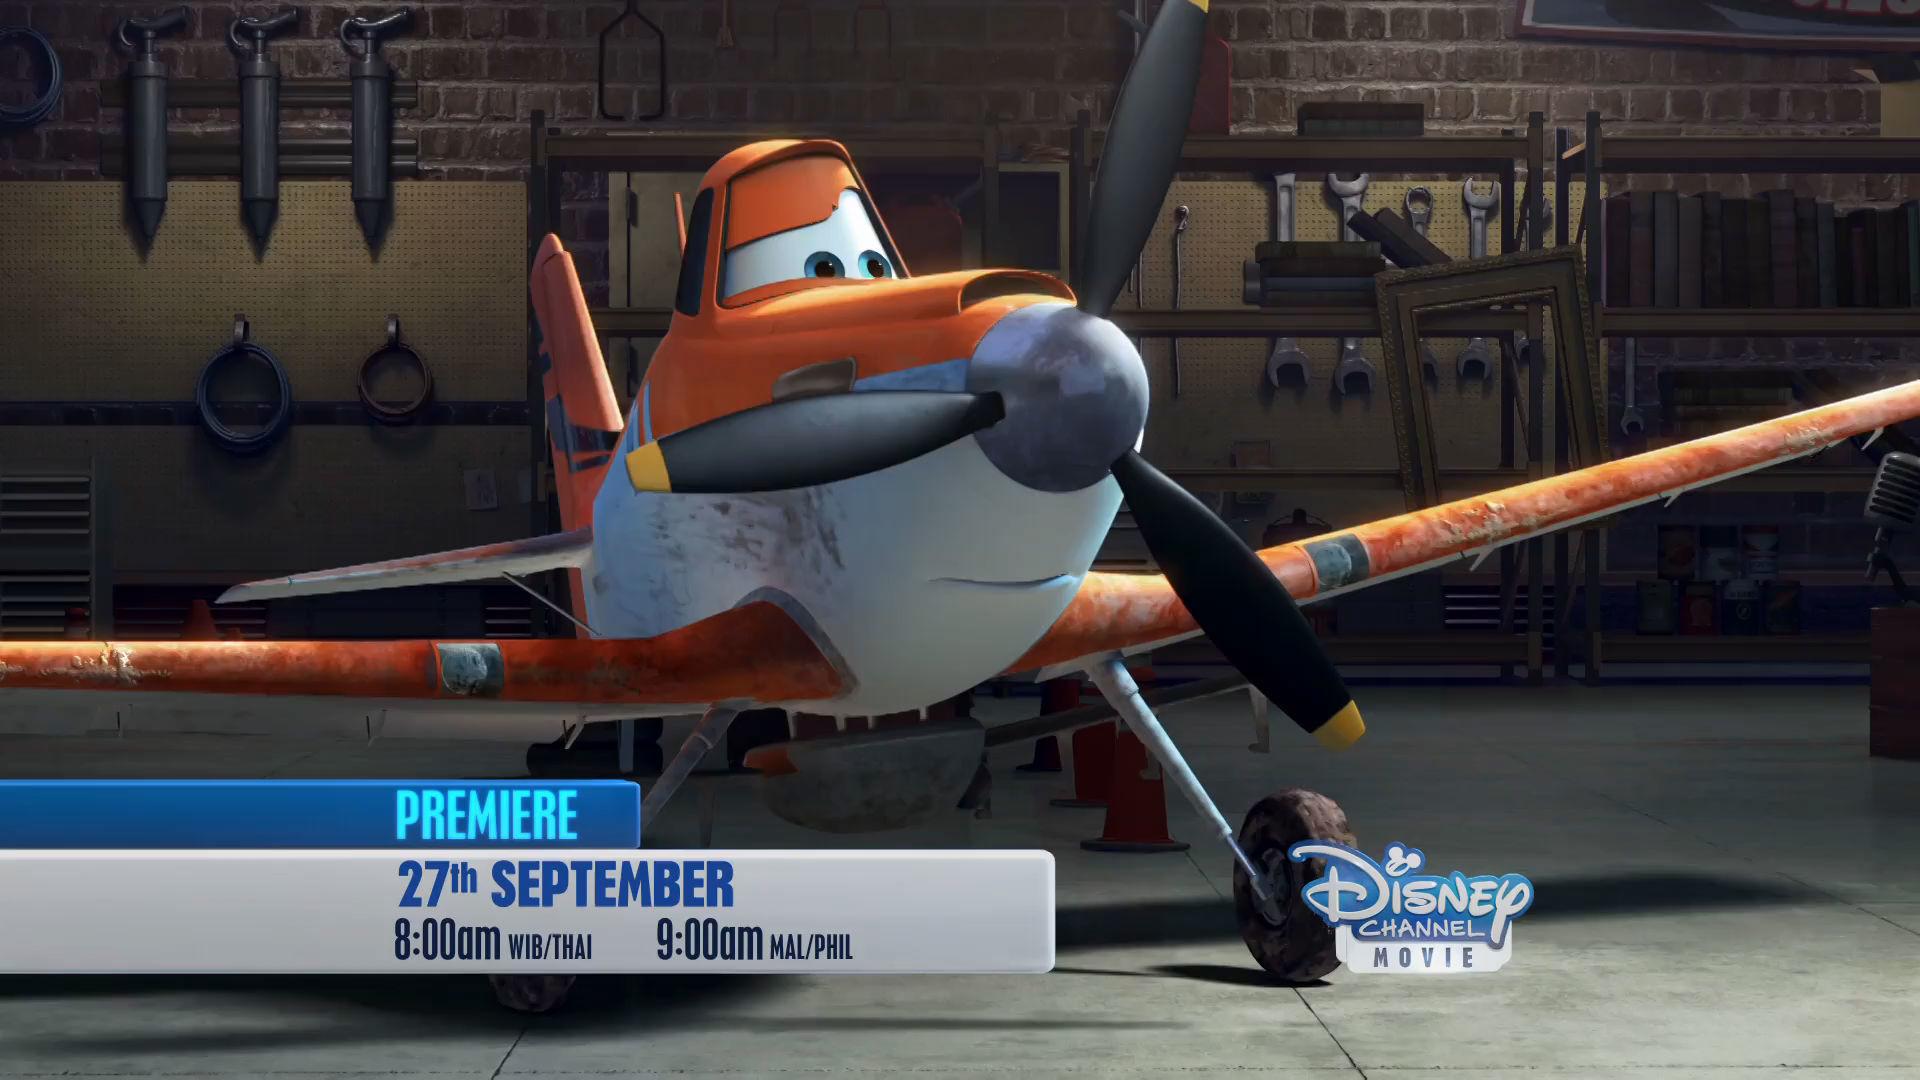 Planes on Disney Channel